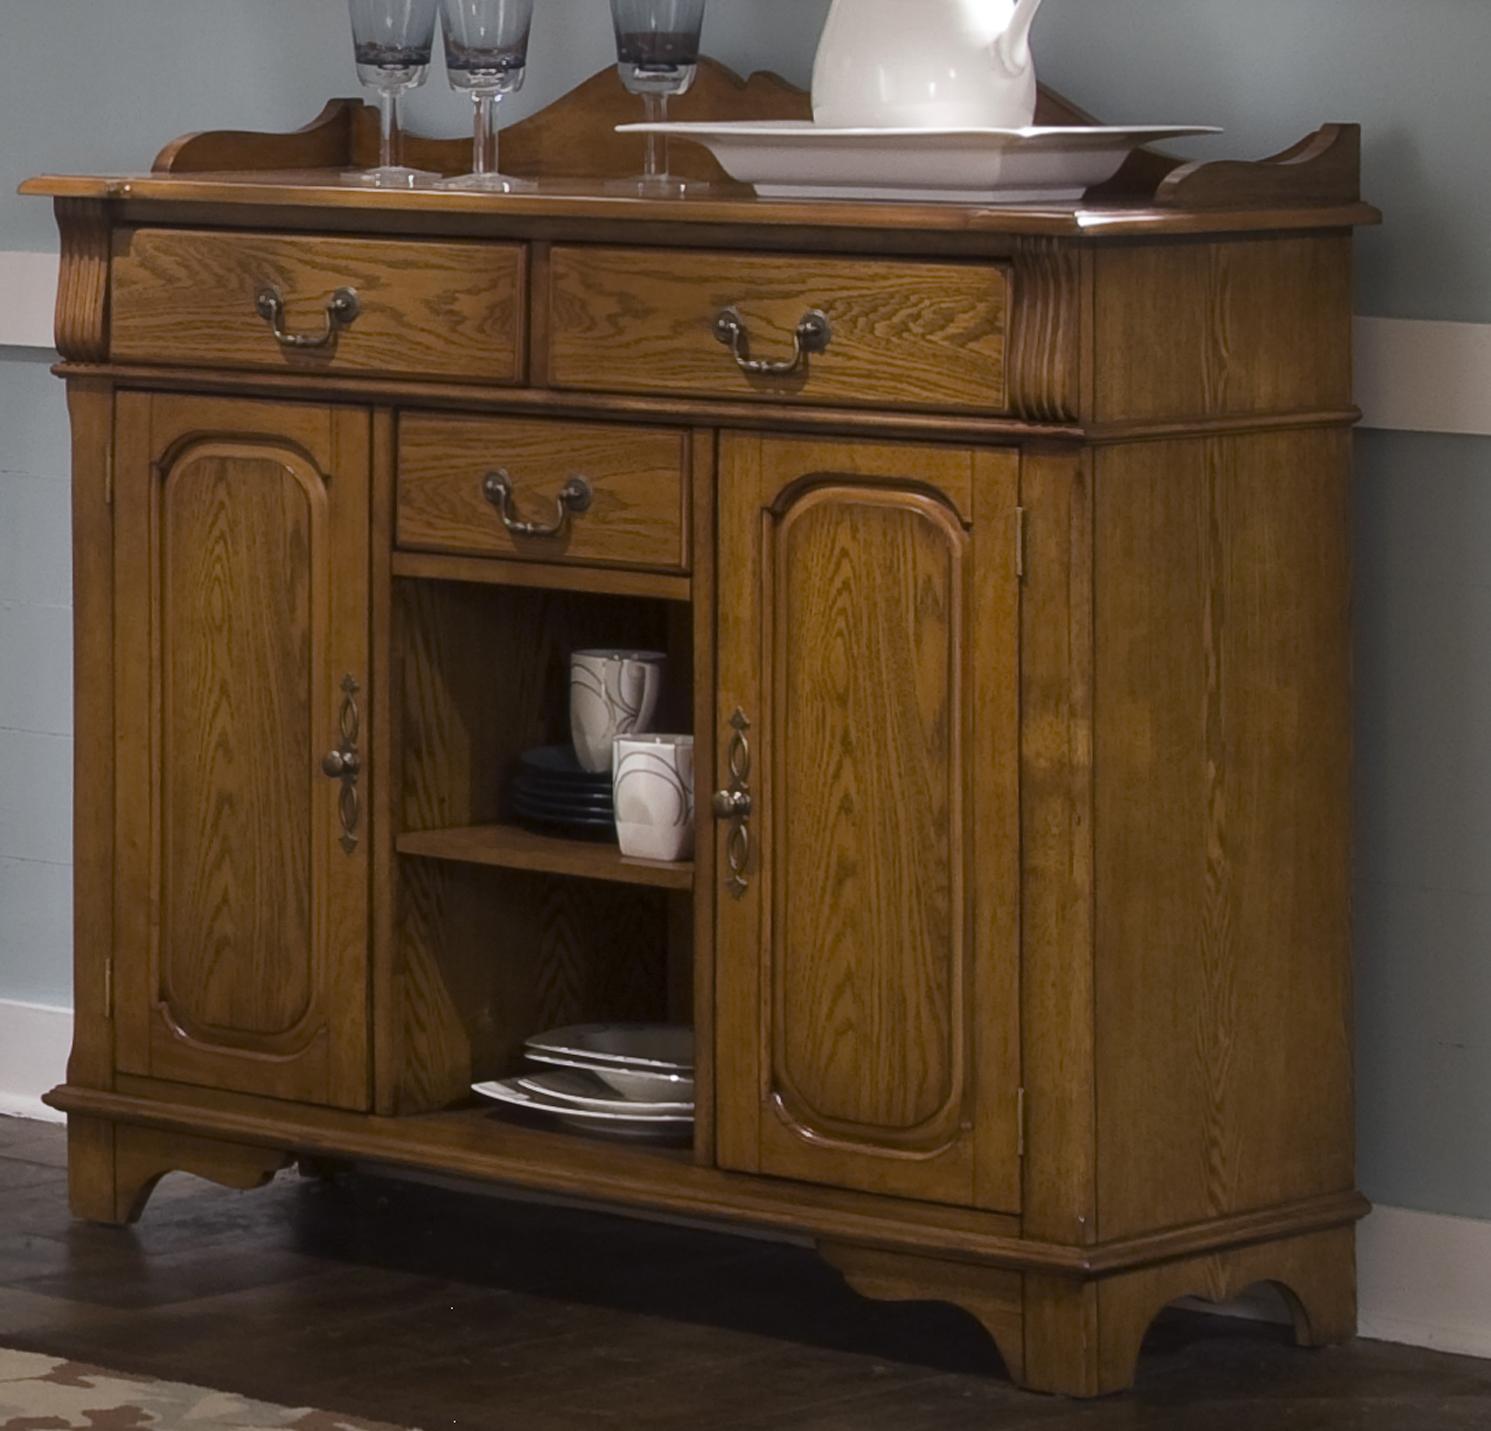 Nostalgia  Server by Liberty Furniture at Lapeer Furniture & Mattress Center